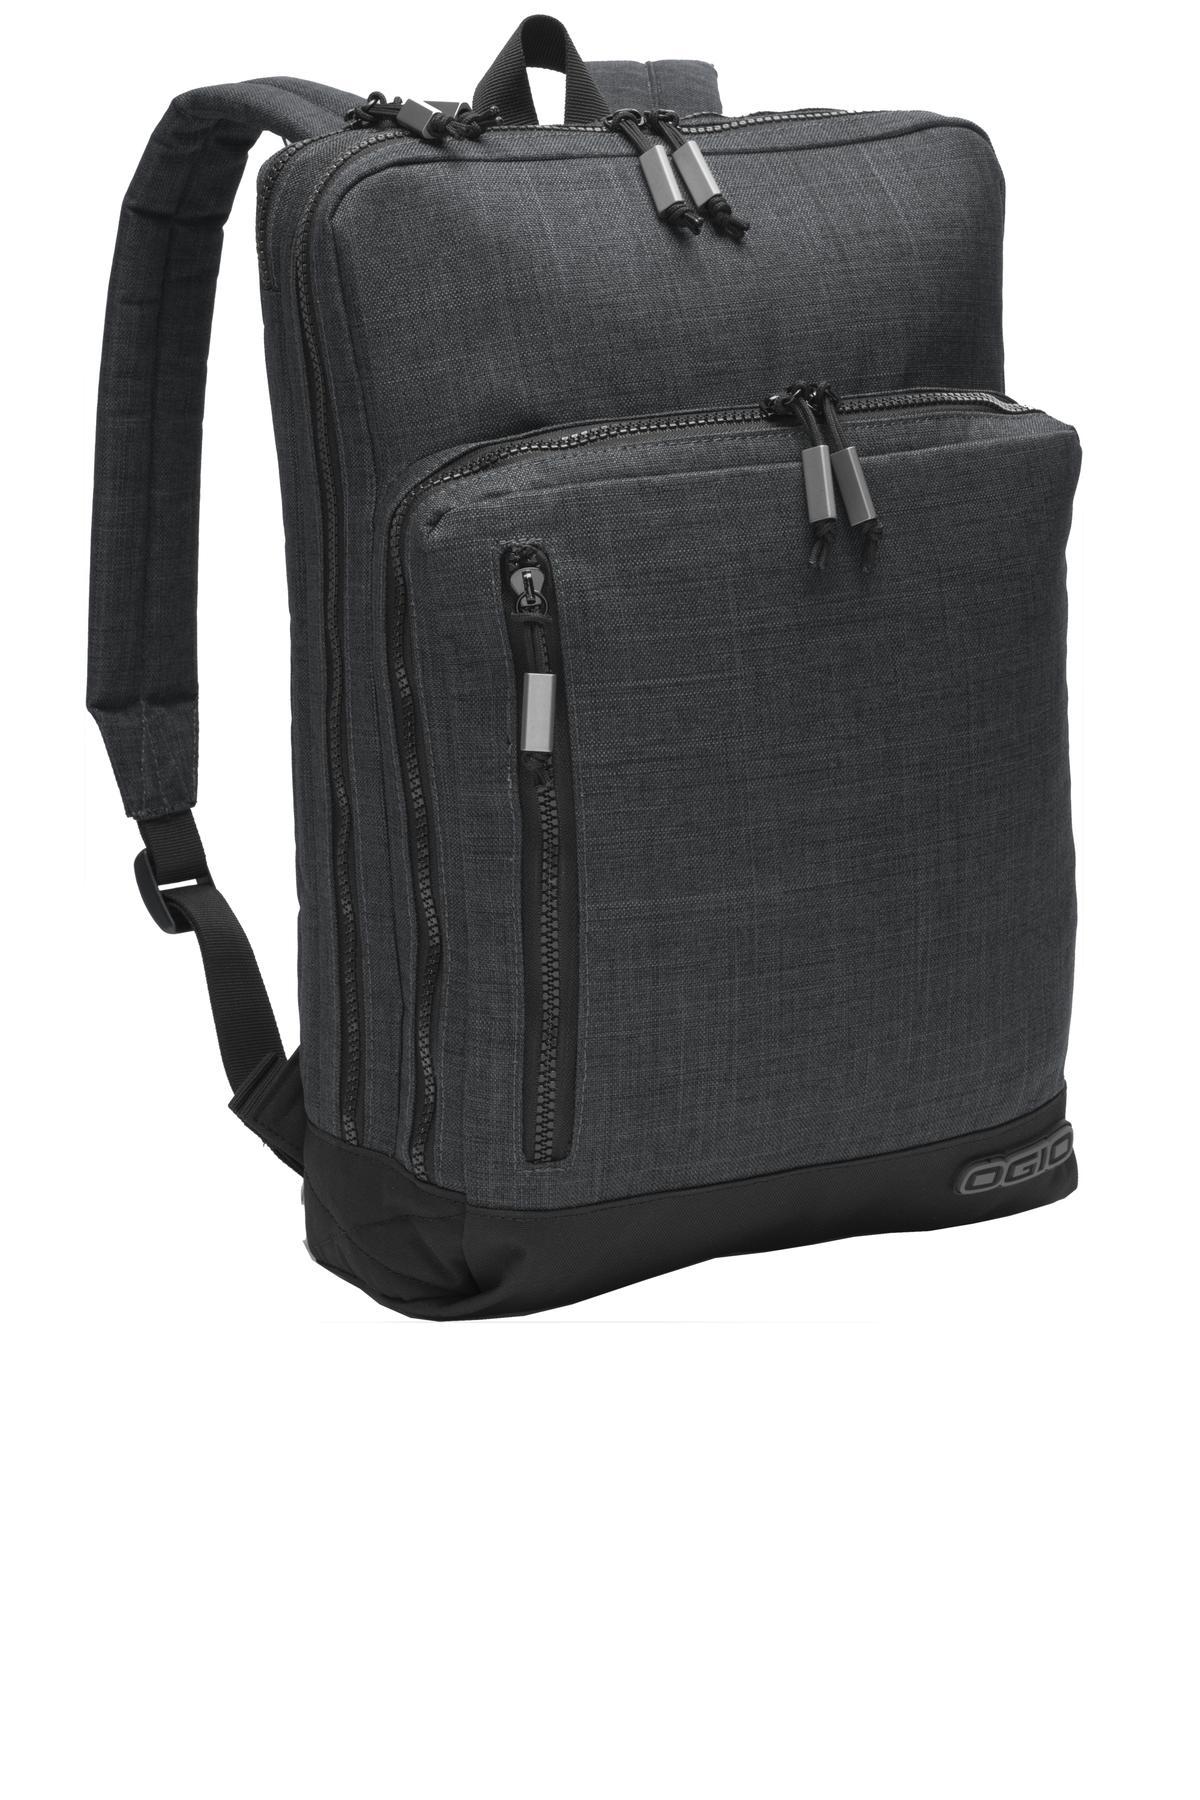 OGIO  411086 - Sly Pack